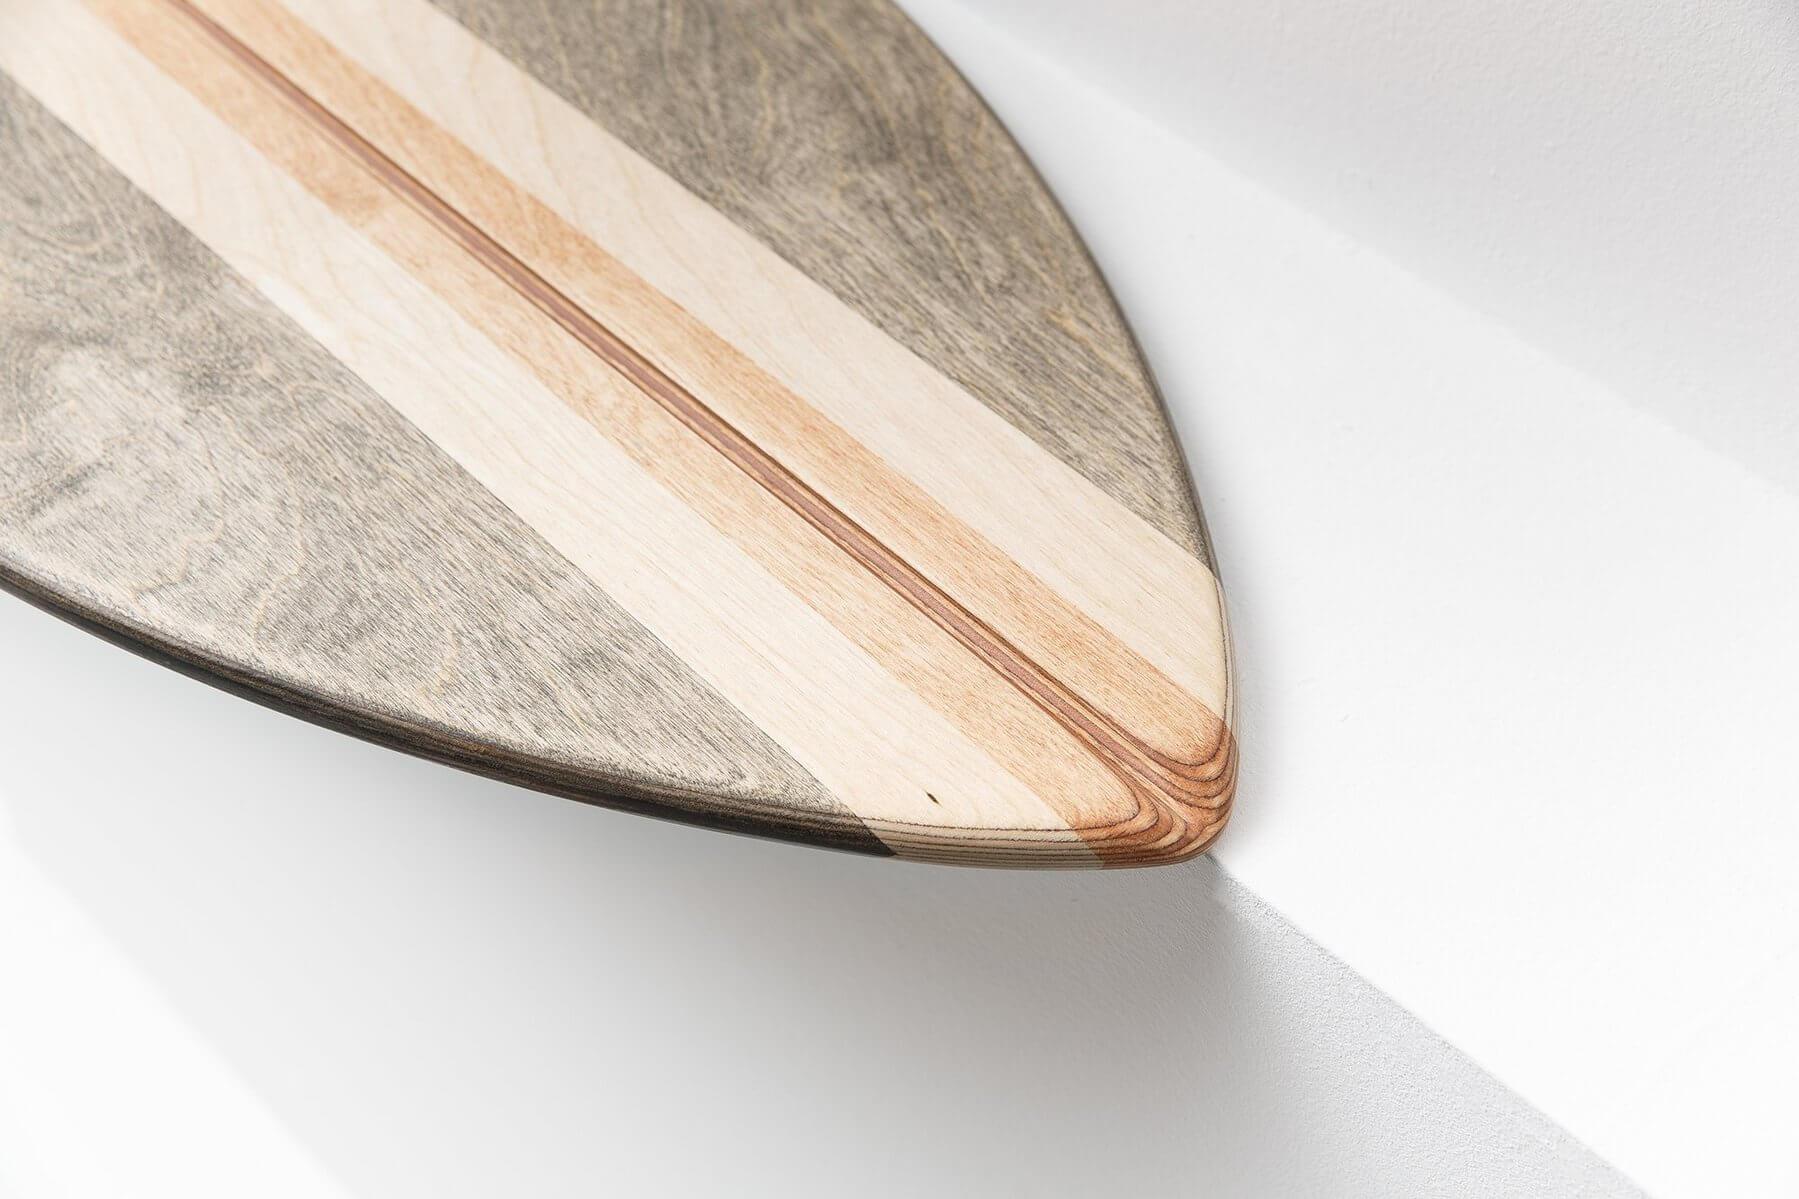 Bredder Boards Pualani Shorty (Bild 2)